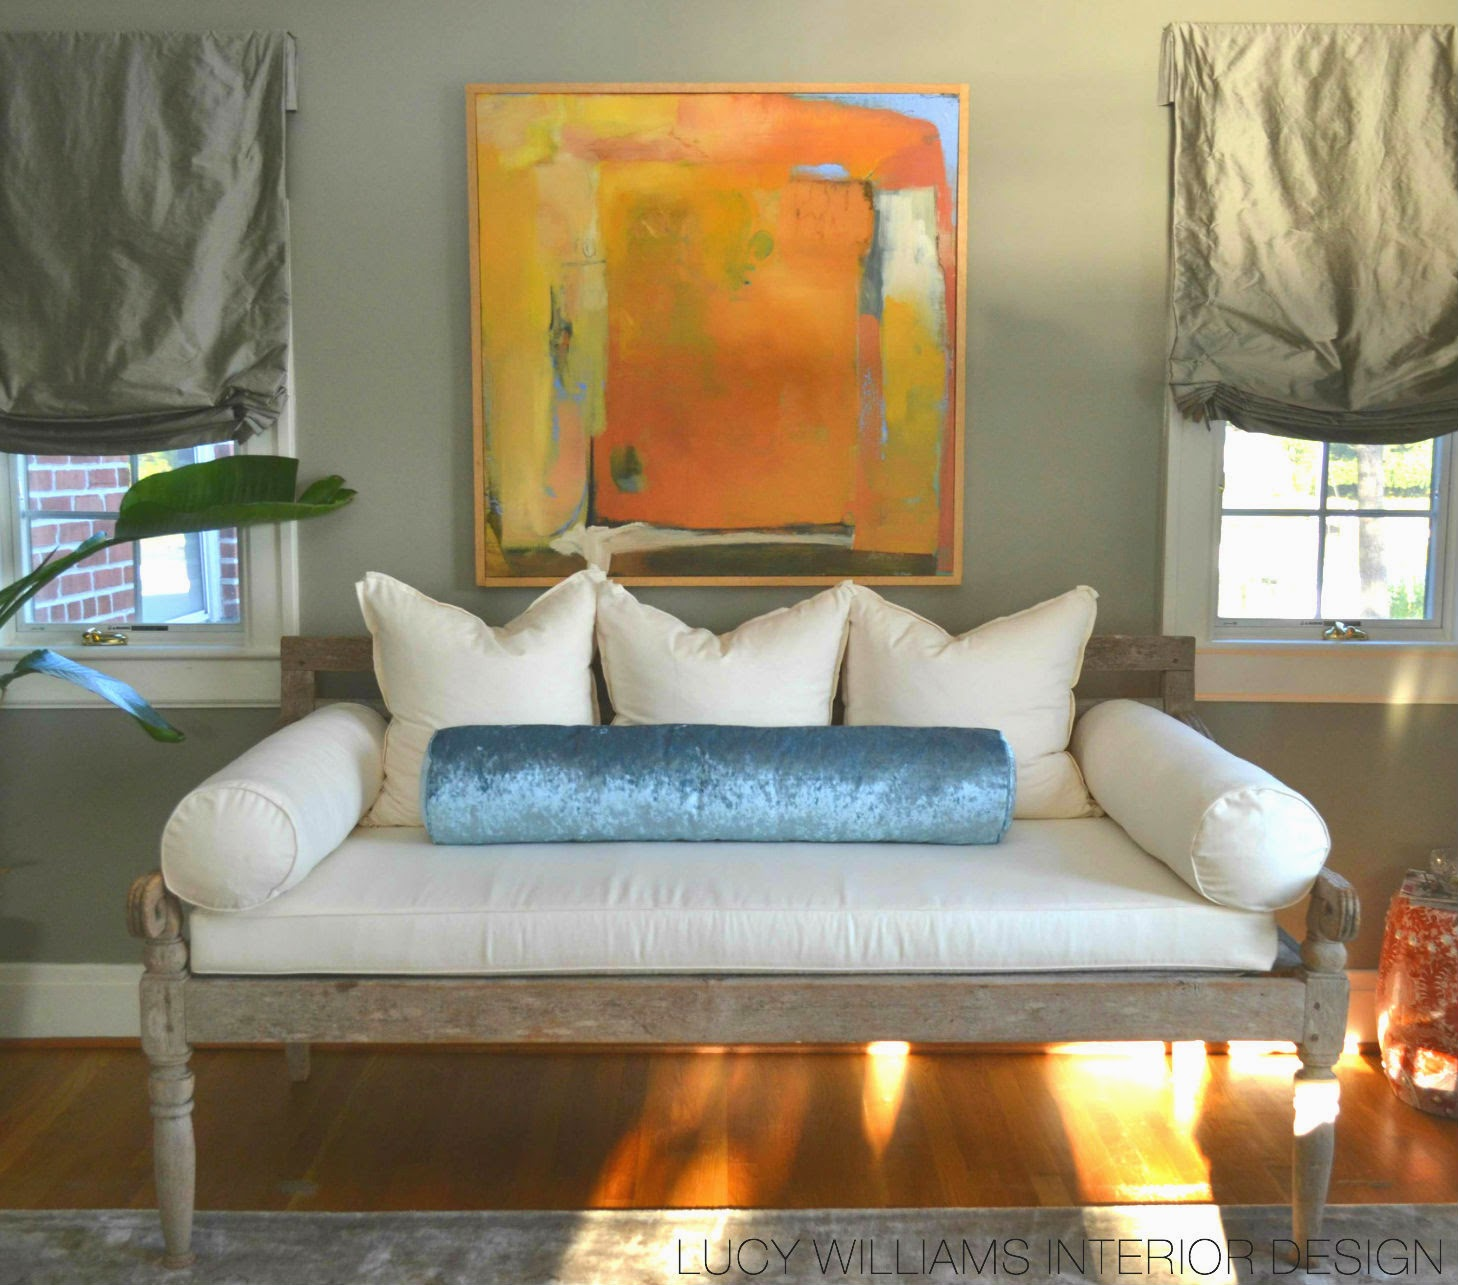 Lucy williams interior design blog sylvan the latest for Lucy williams interiors